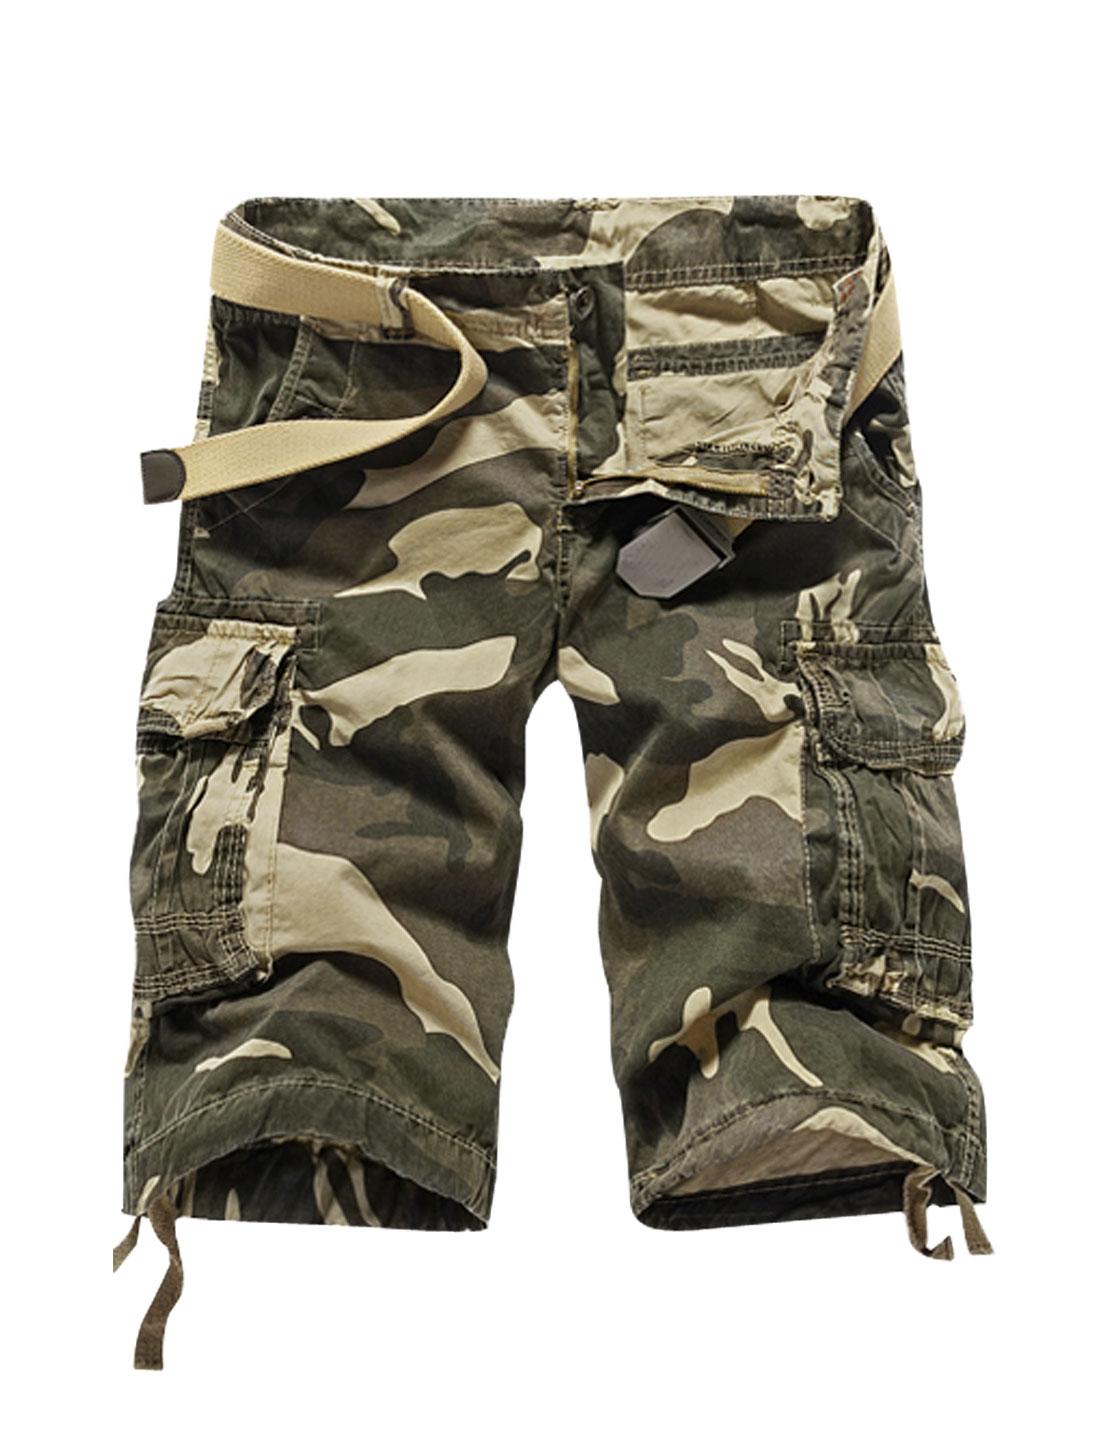 Man Camouflage Pattern Drawstring Cuffs Cargo Shorts Beige Khaki W34